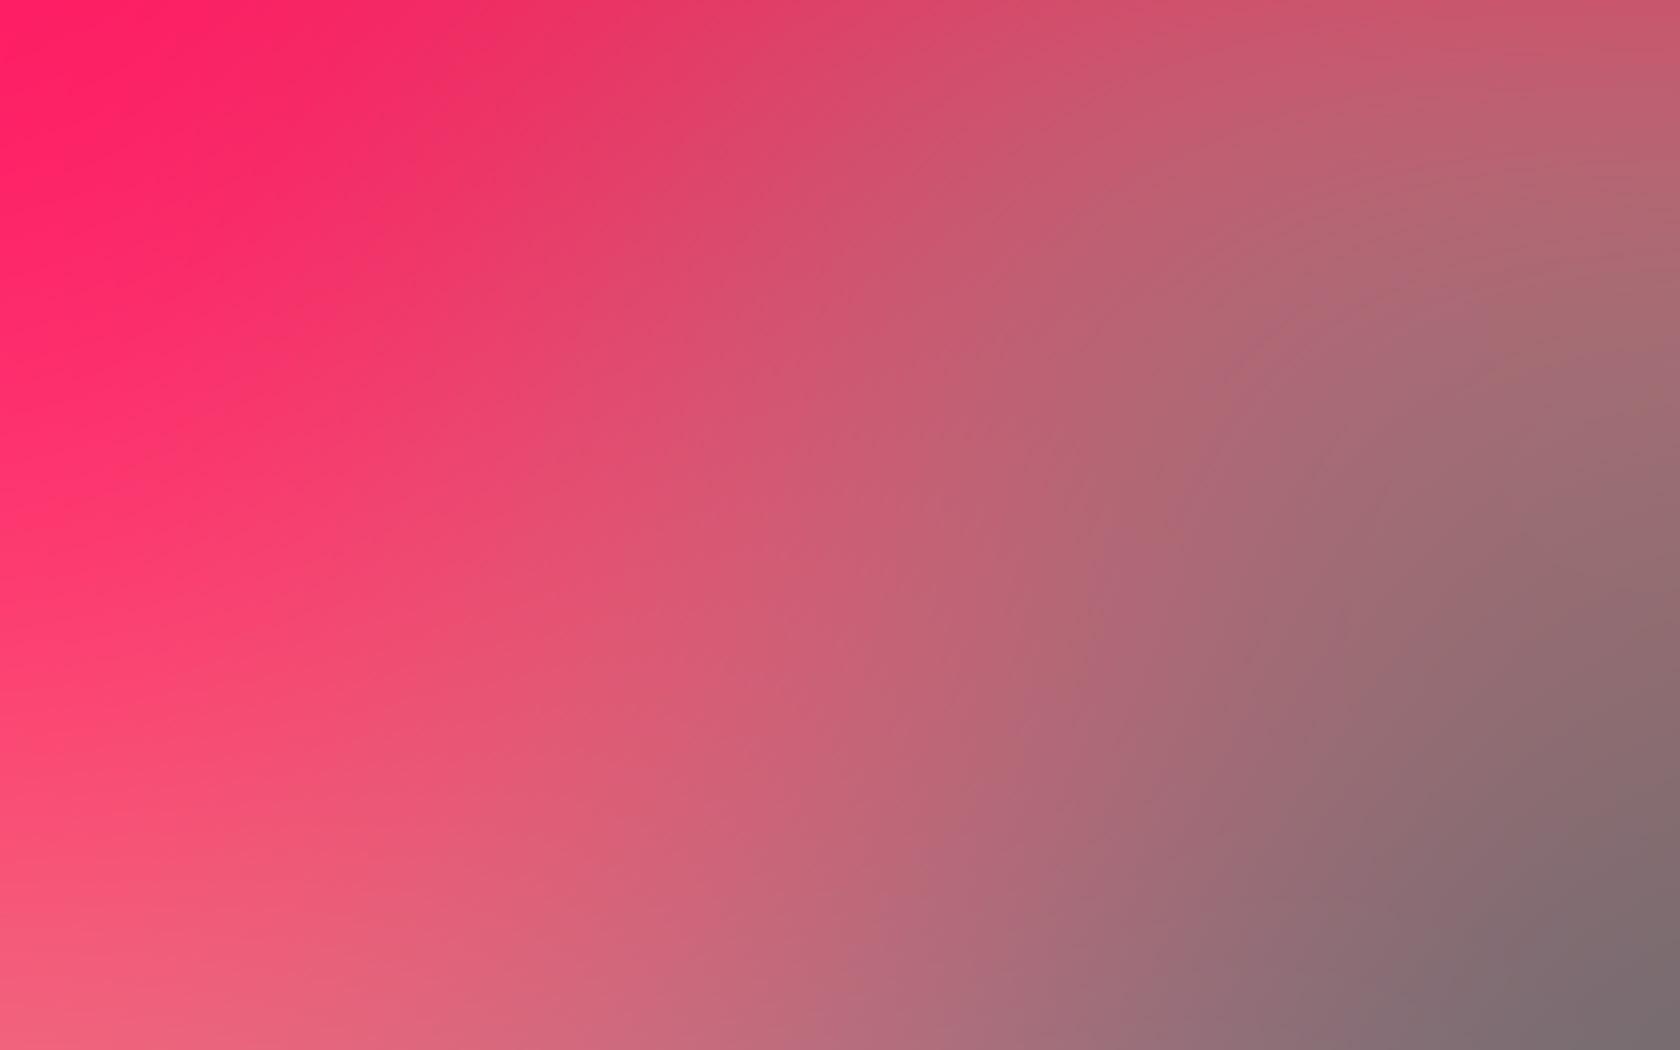 si36-pinkish-red-gradation-blur-wallpaper